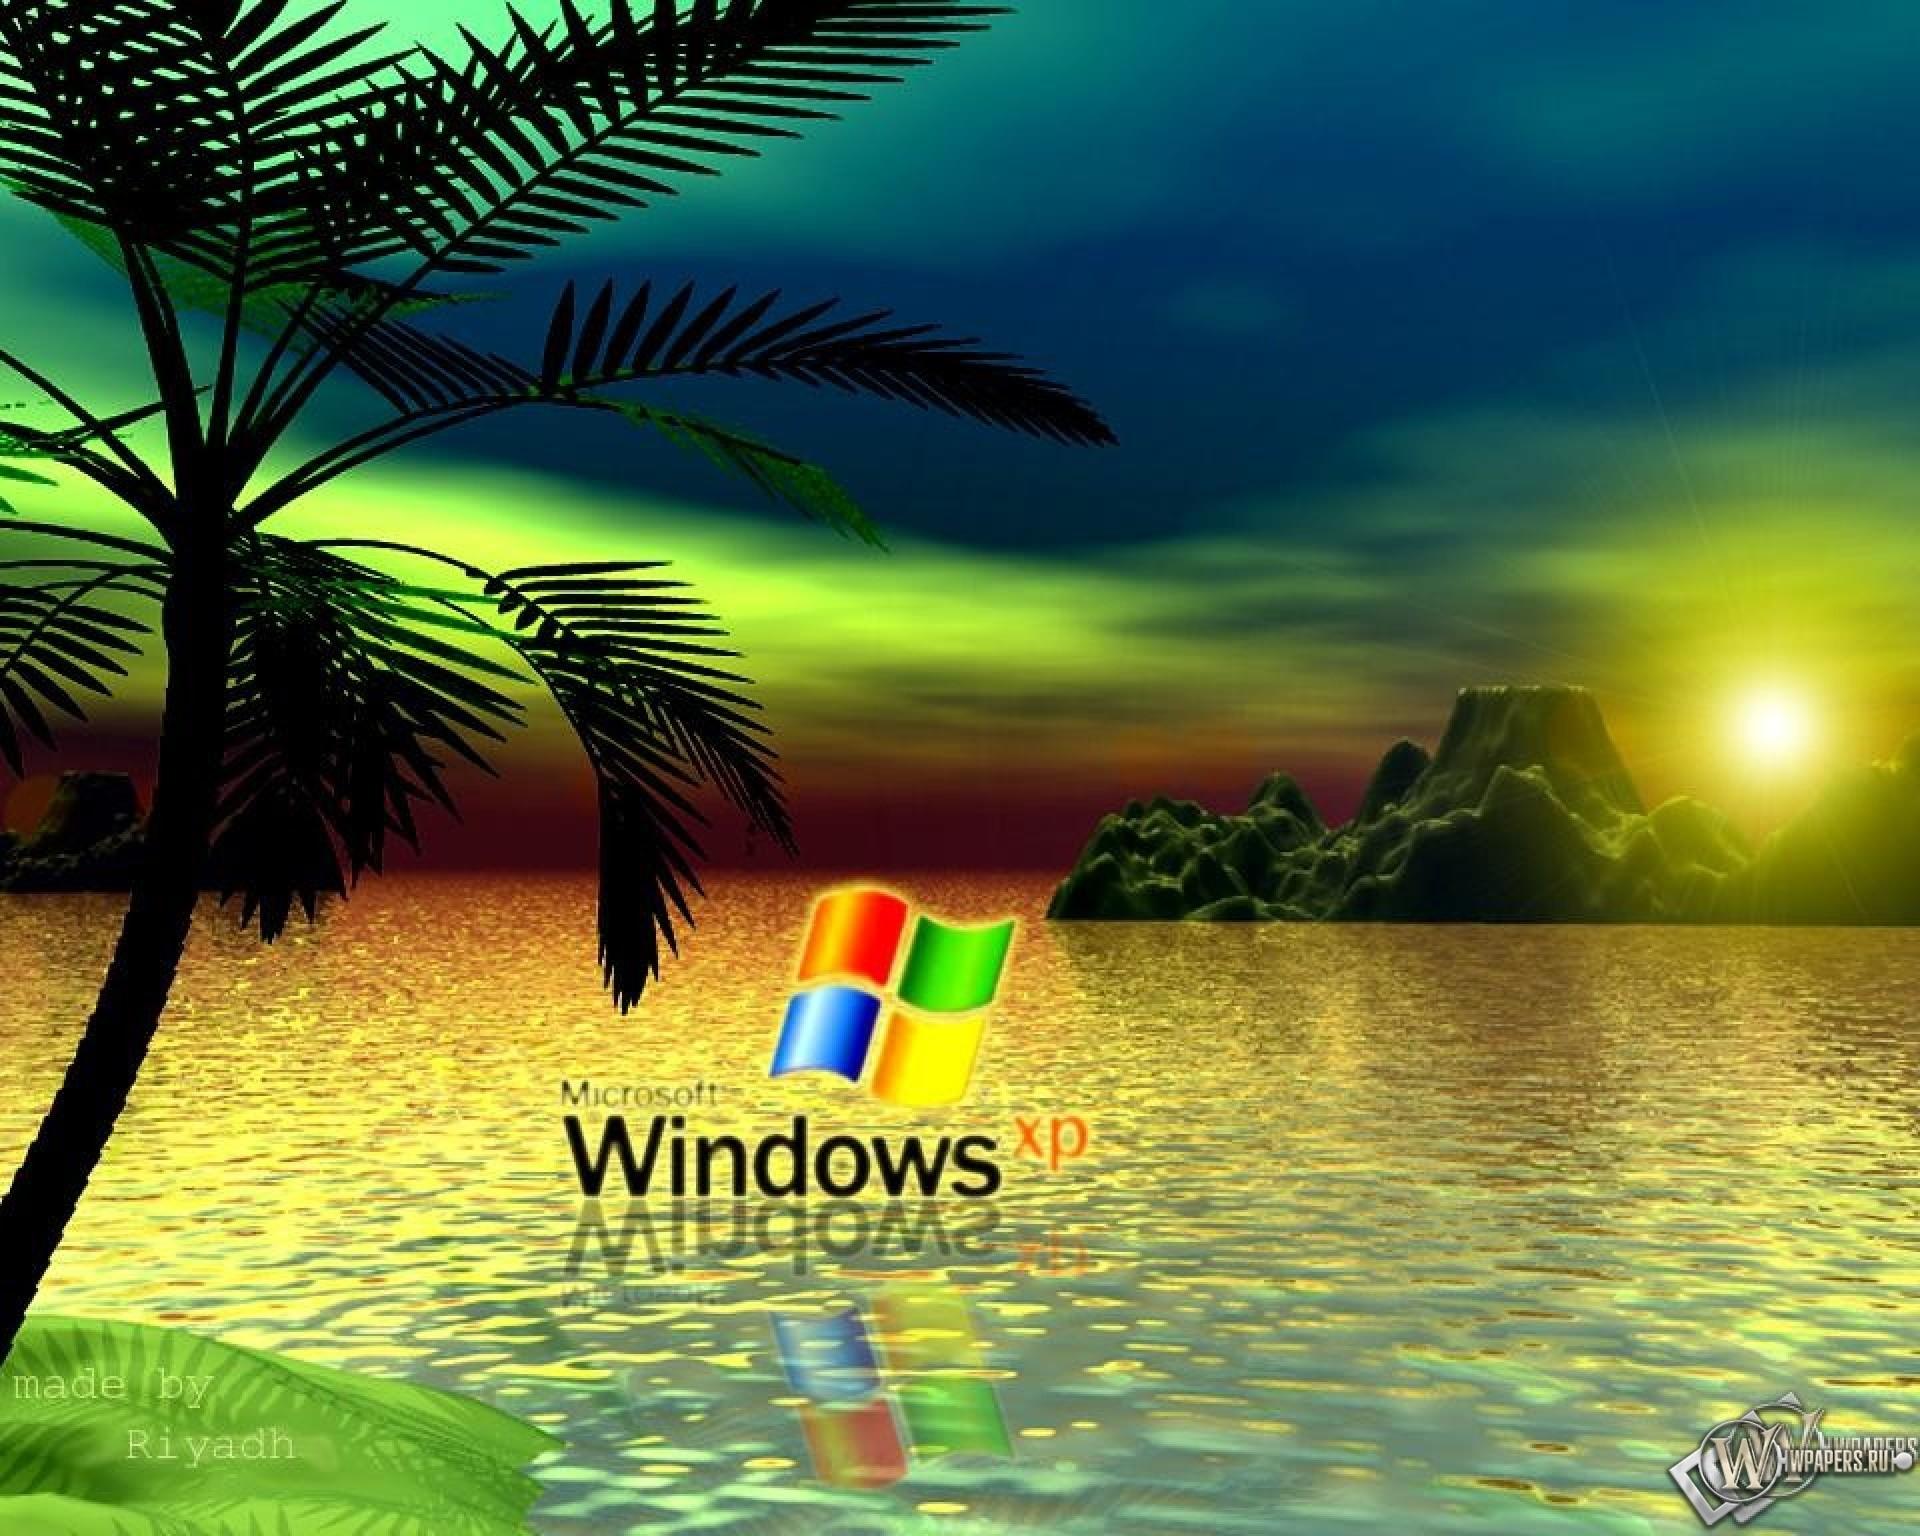 Windows xp wallpaper hd wallpapertag for Sfondi invernali per desktop gratis